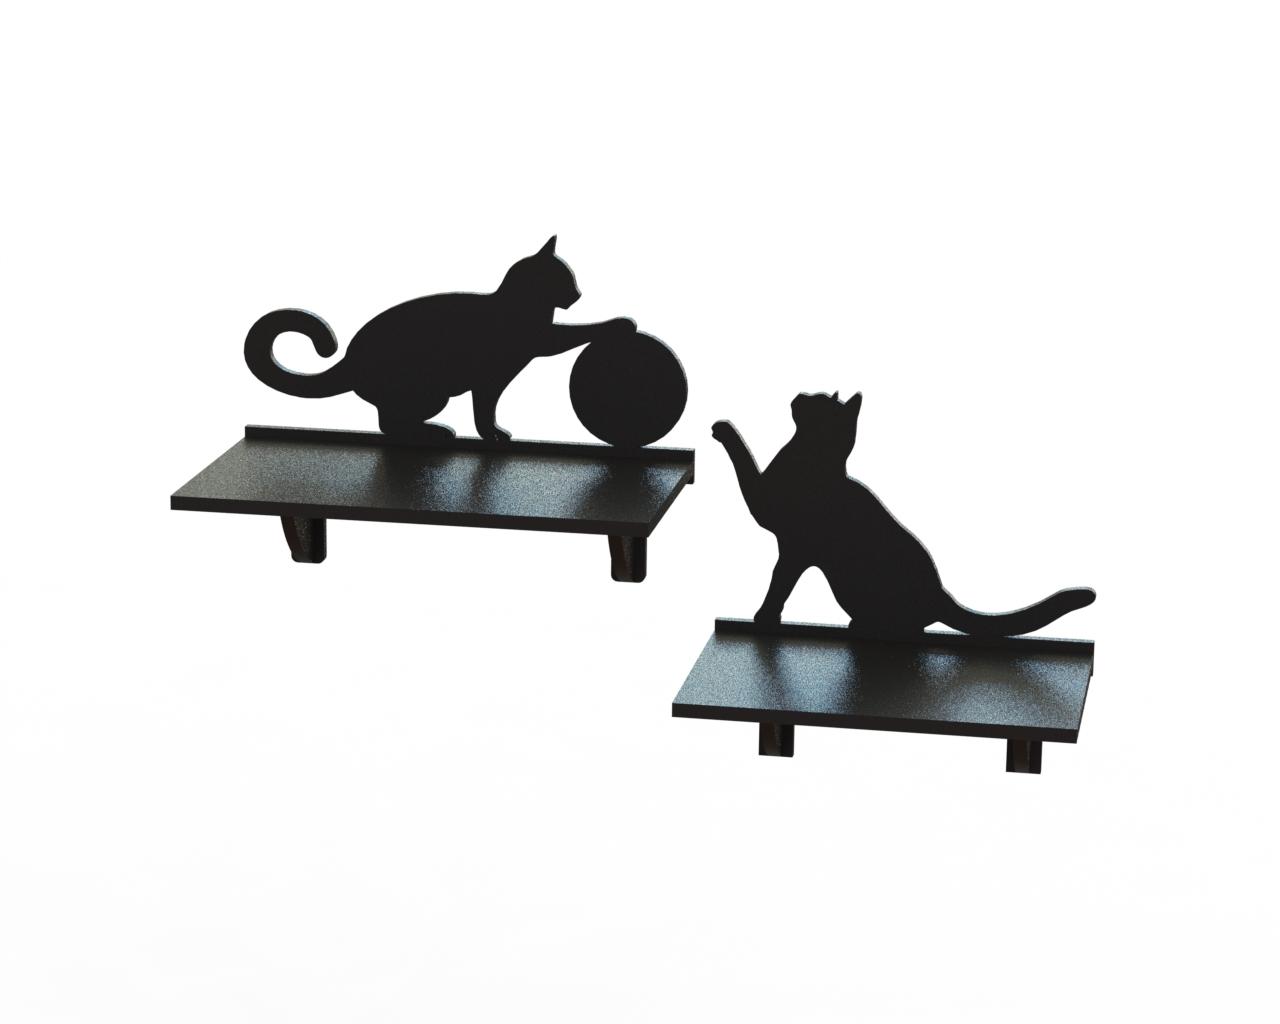 Laser Cut Cnc Project Cat Shaped Rack Free DXF File